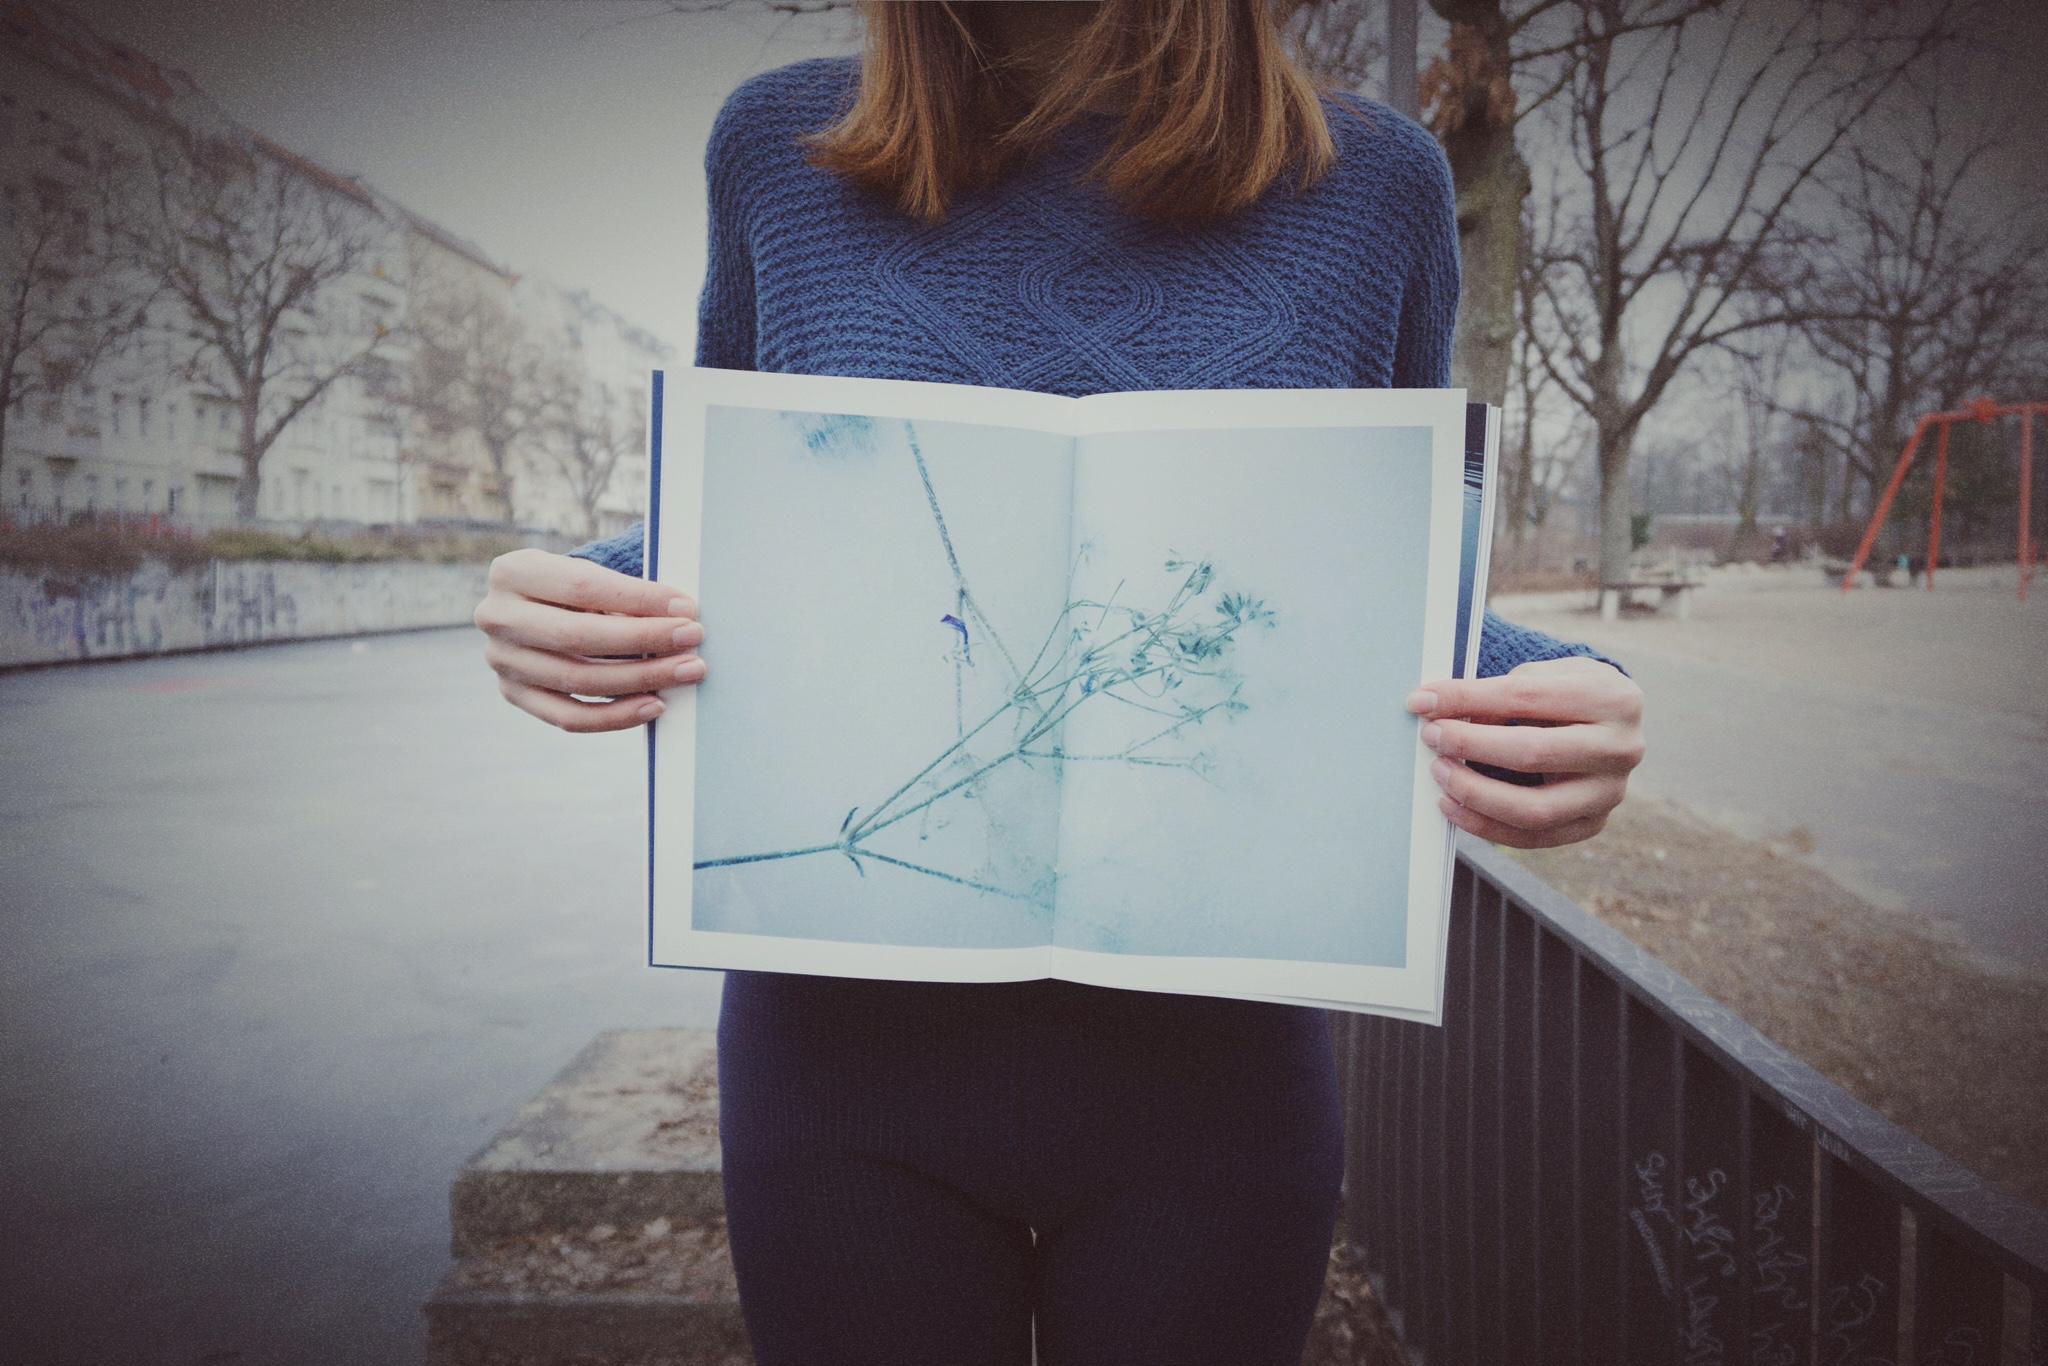 © Irene Cruz - Drowning in blue